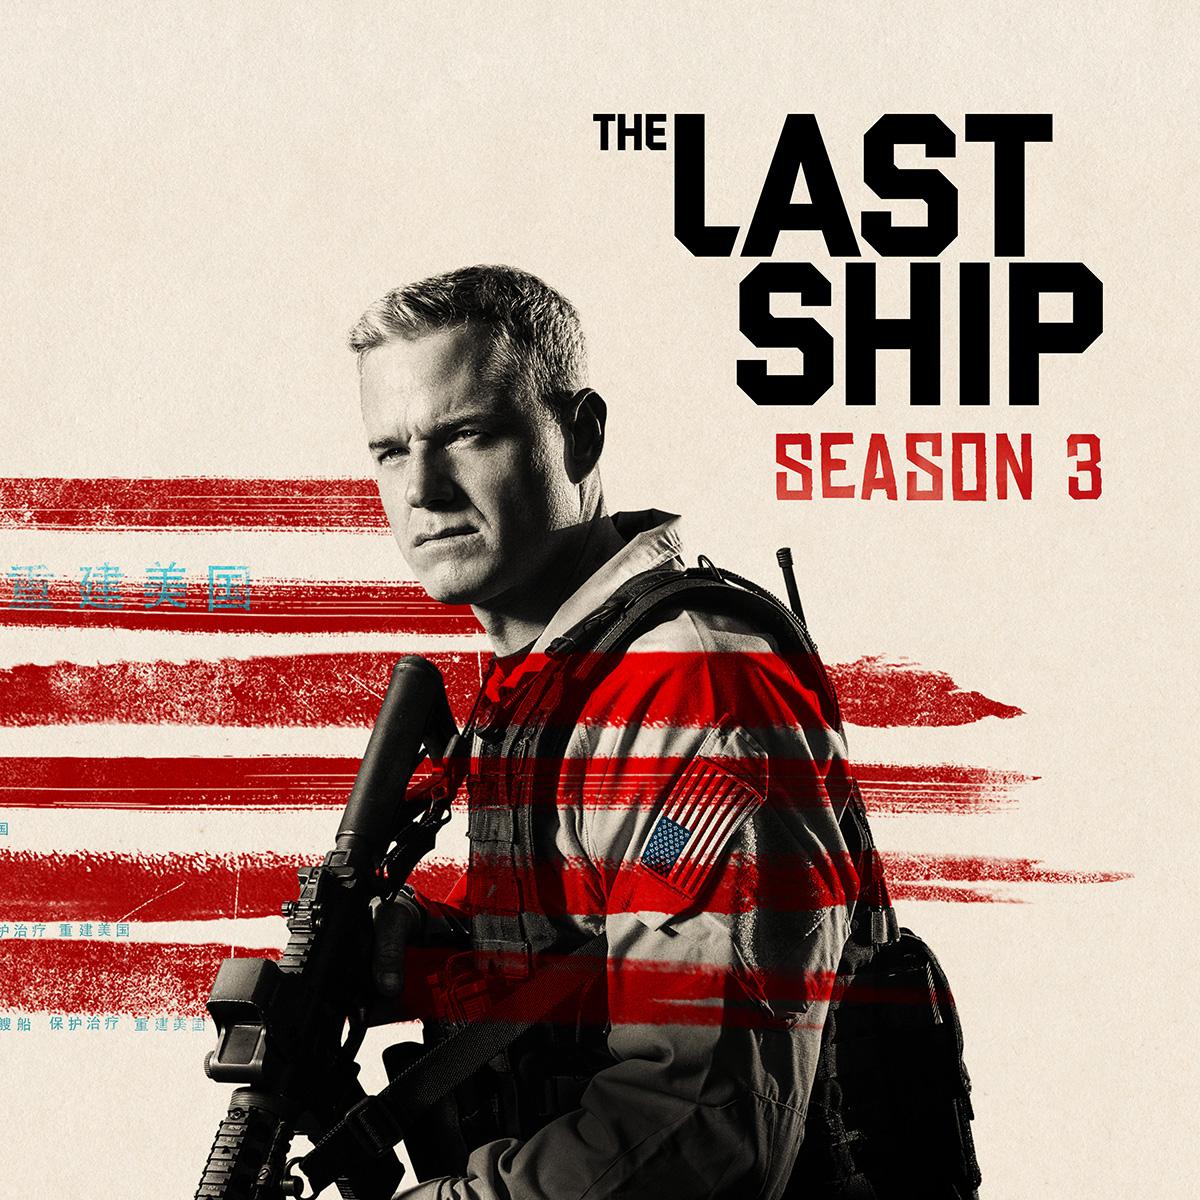 The Last Ship Tnt Promos Television Promos